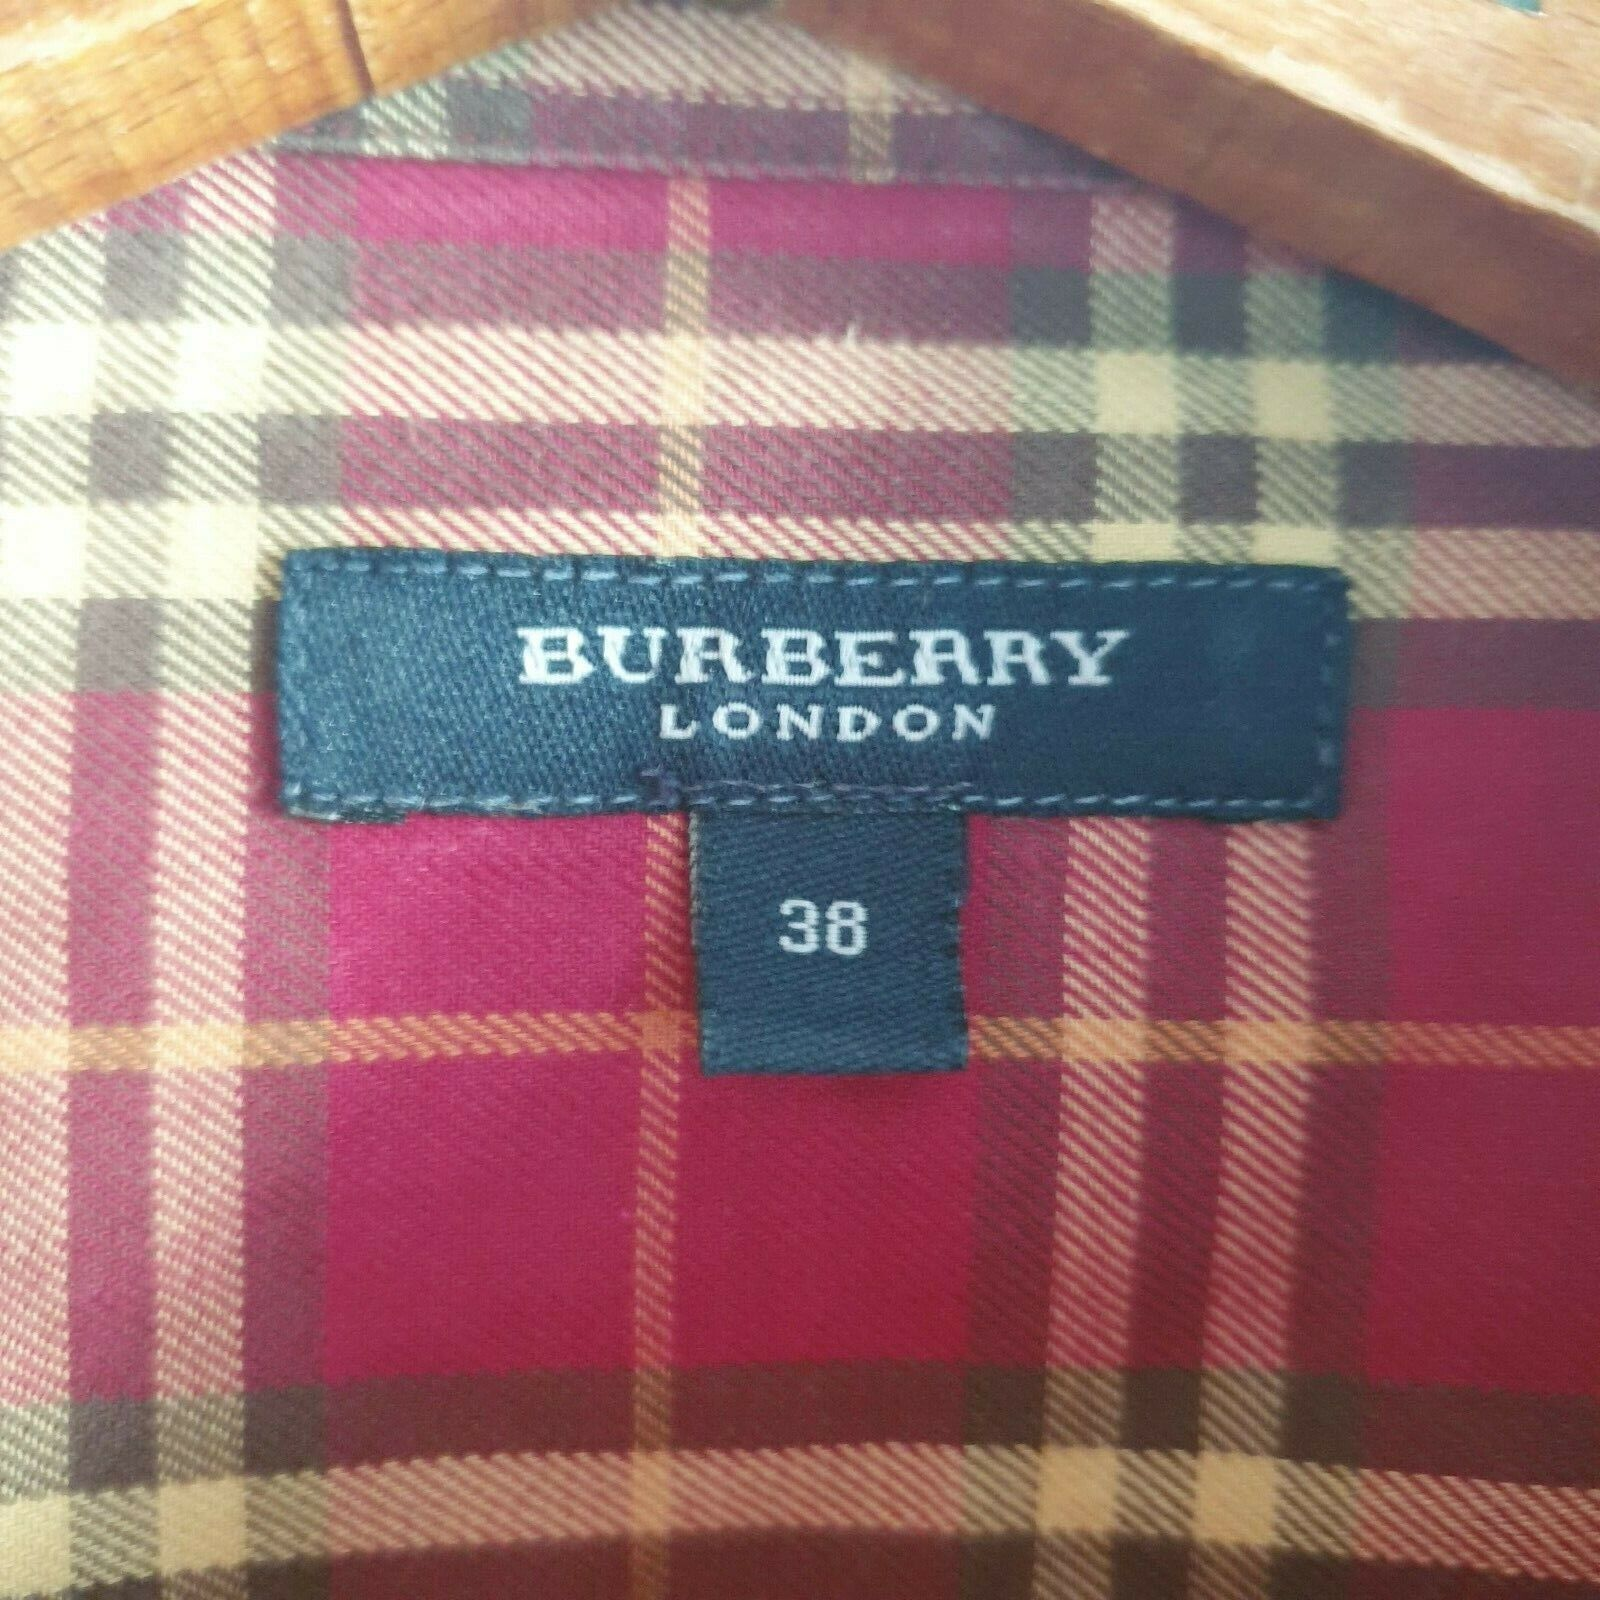 Chemise burberry femme / comme neuve / 38